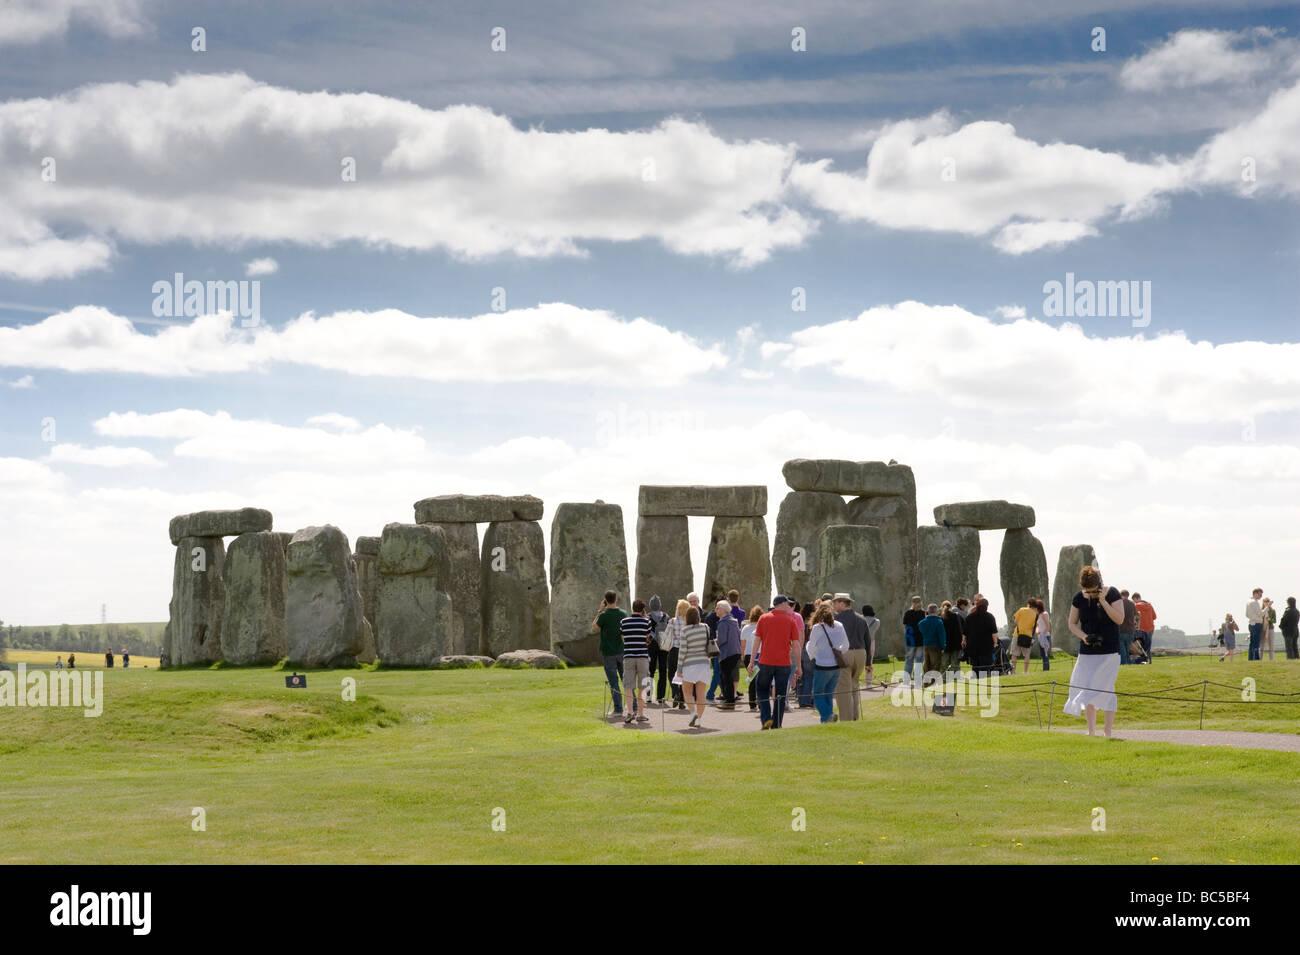 Stenehenge England - Stock Image